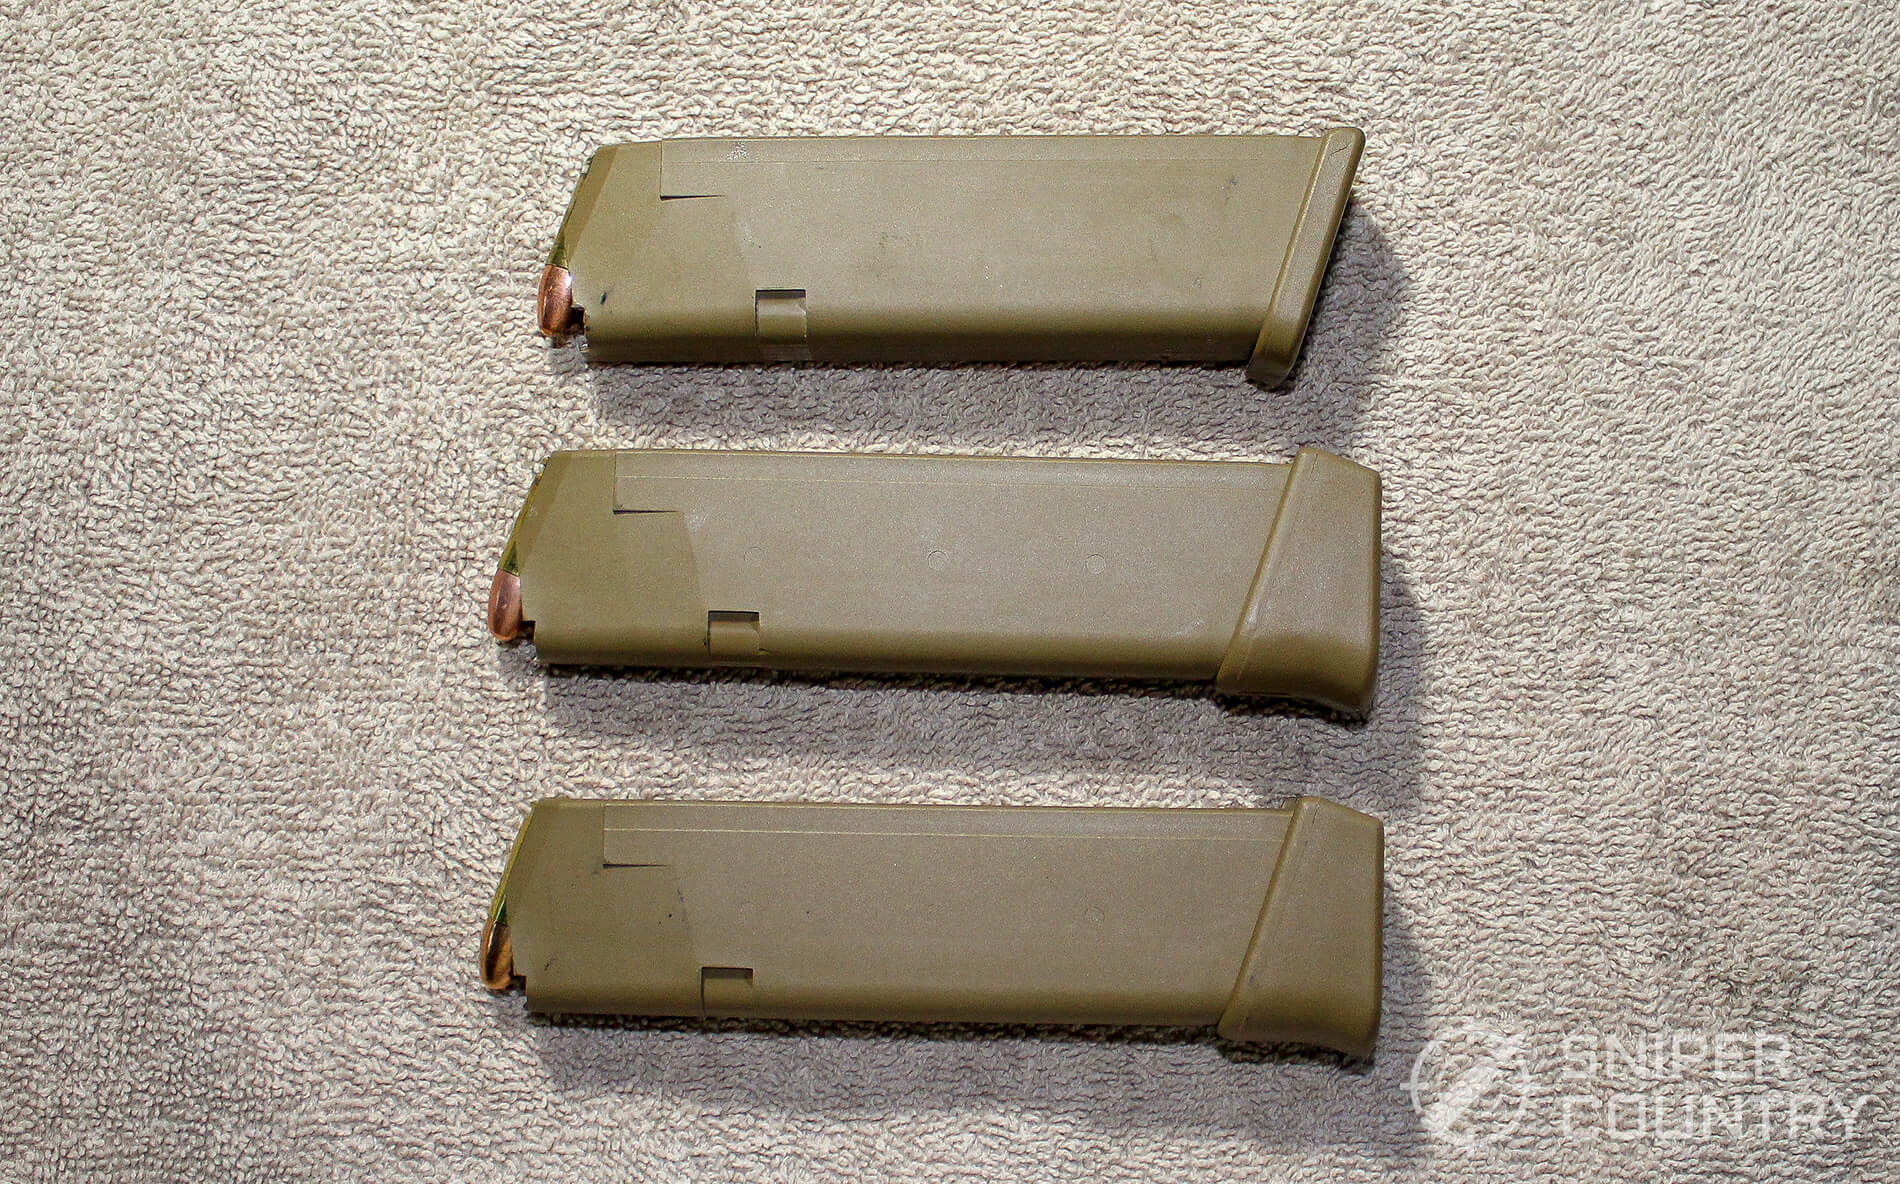 Glock G19X magazines